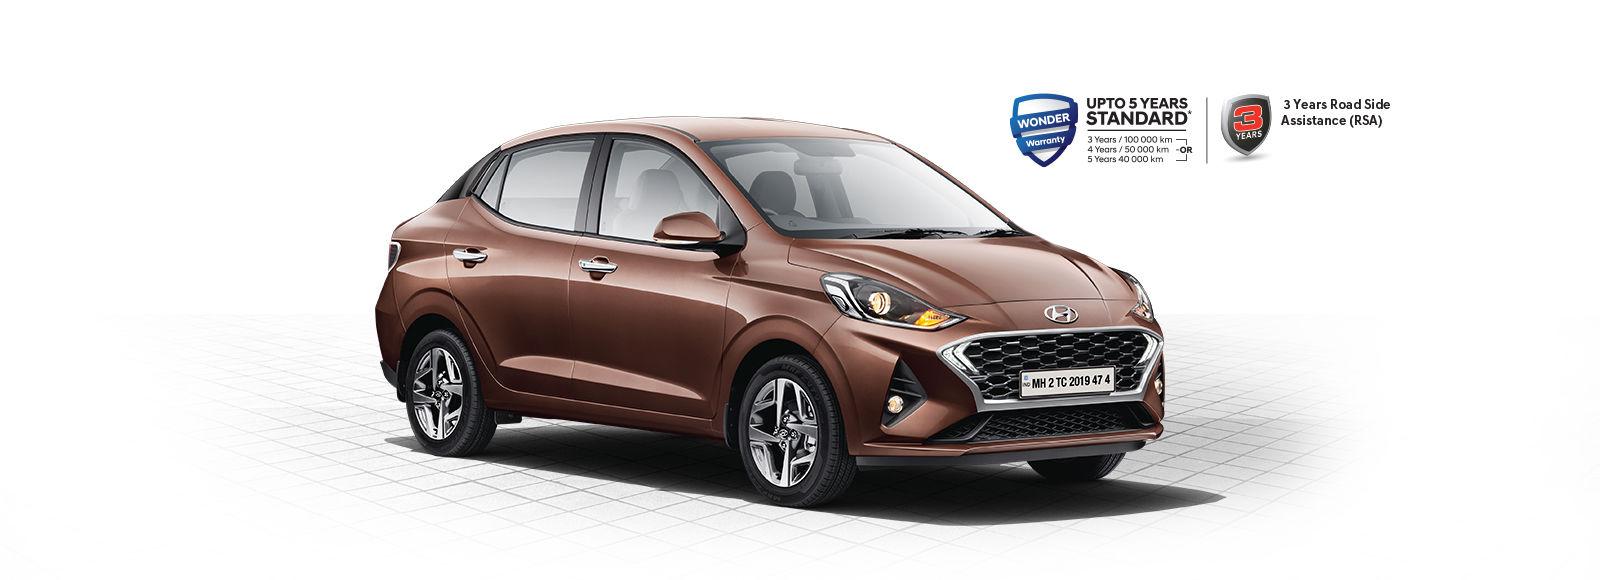 Aura Highlights Stylish New Sedan Hyundai India